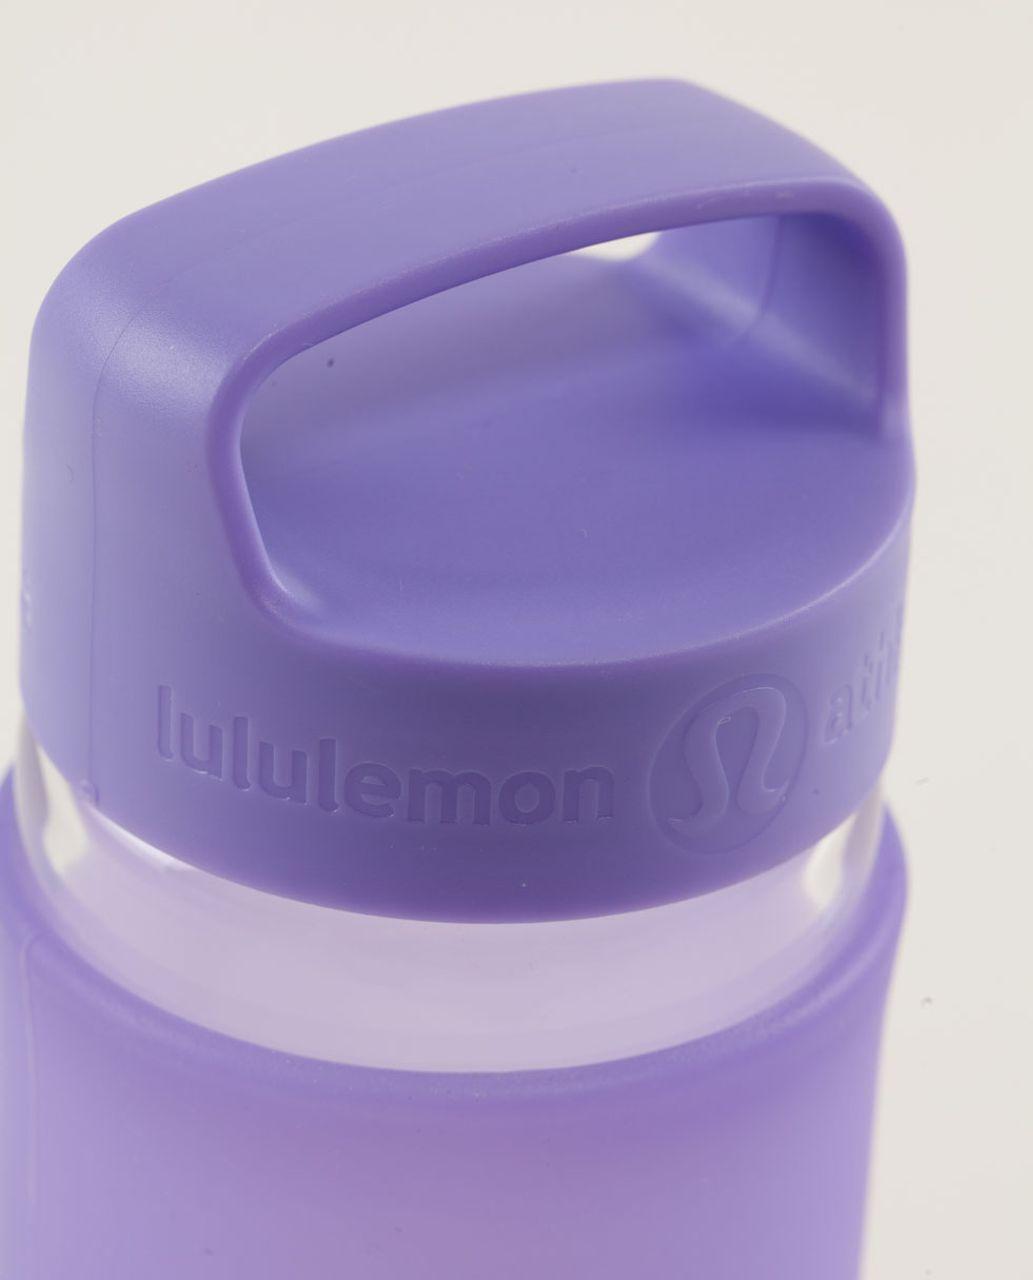 Lululemon Pure Balance Water Bottle - Power Purple (Solid)